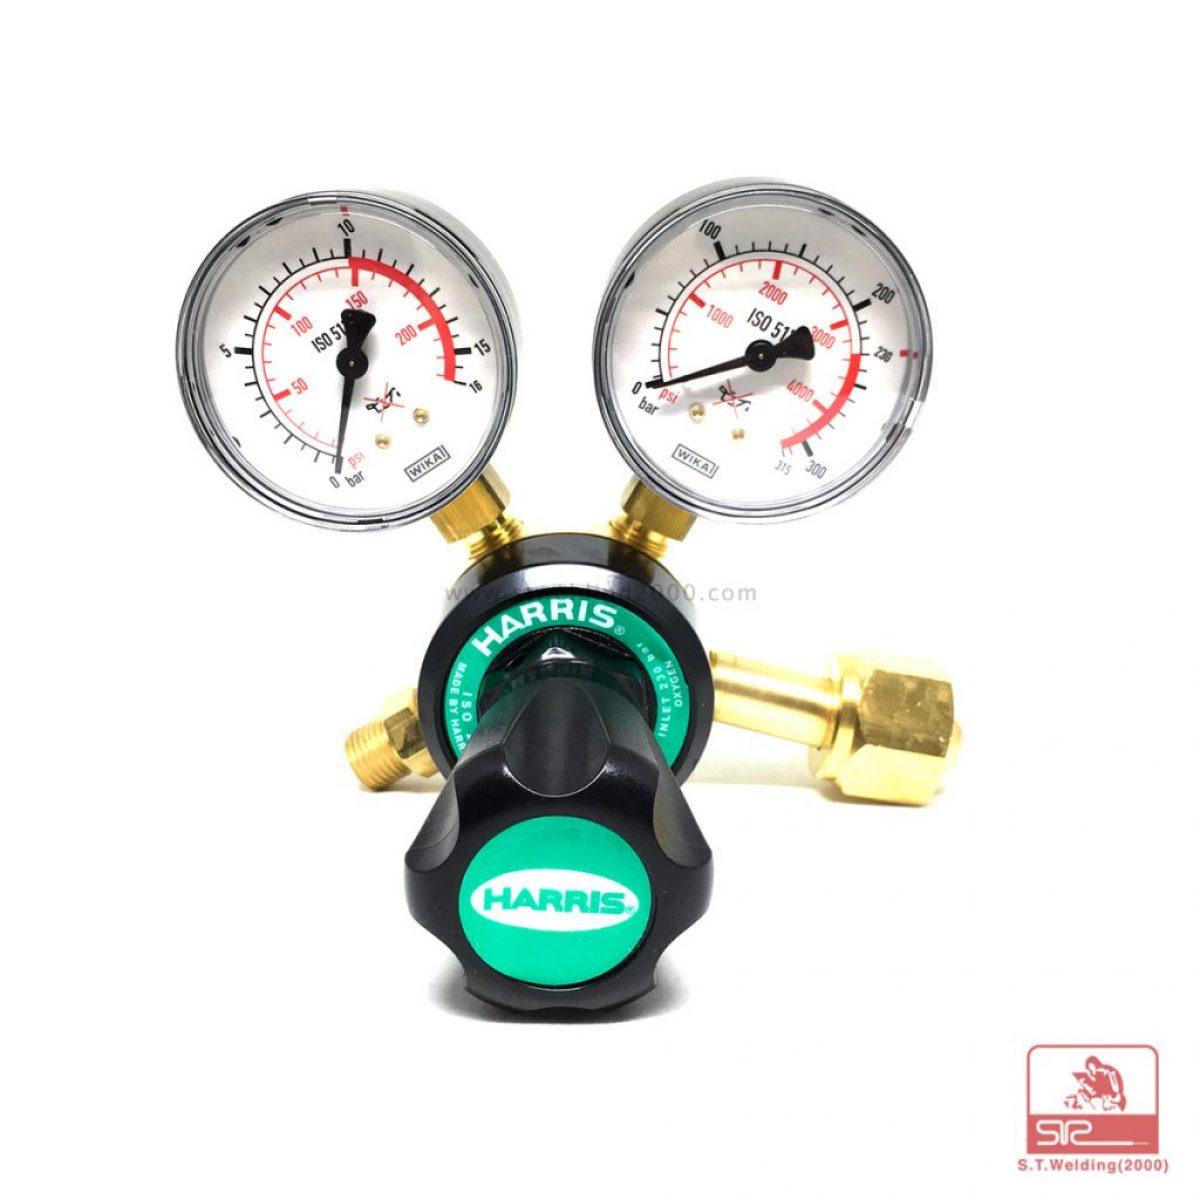 Harris 801 Oxygen(O2)